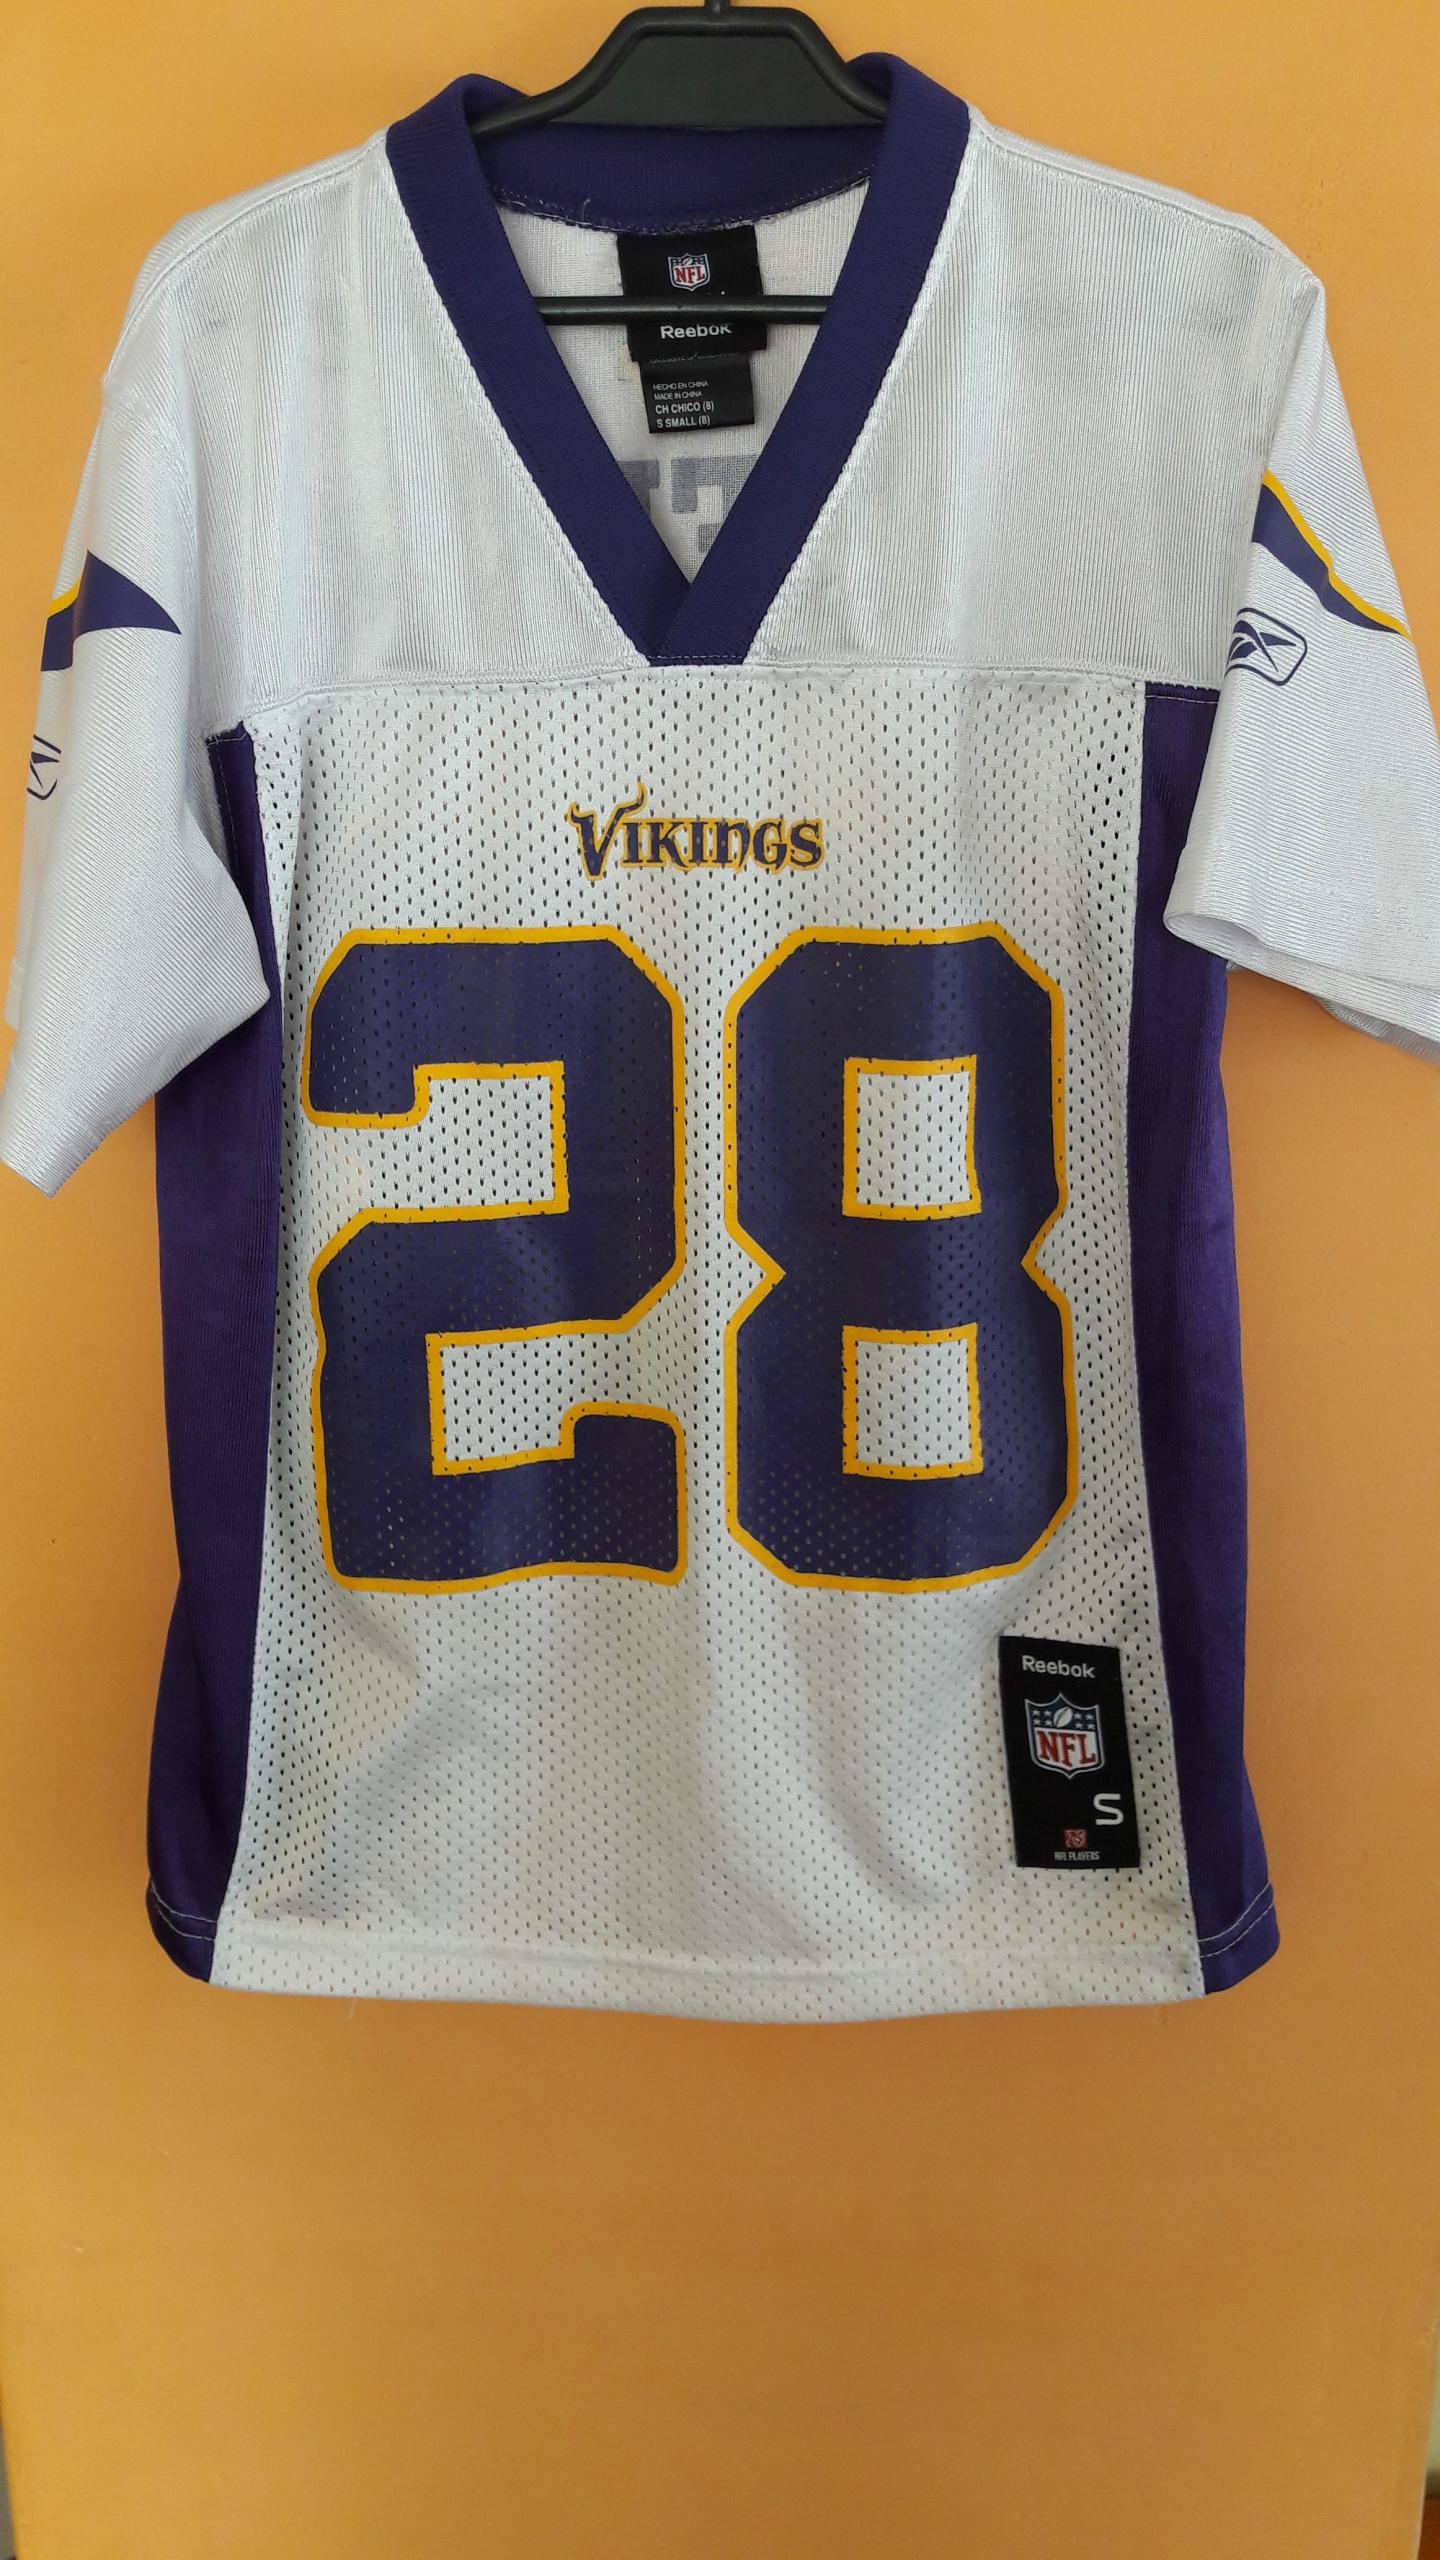 Koszulka NFL Vikings nr 28 Peterson